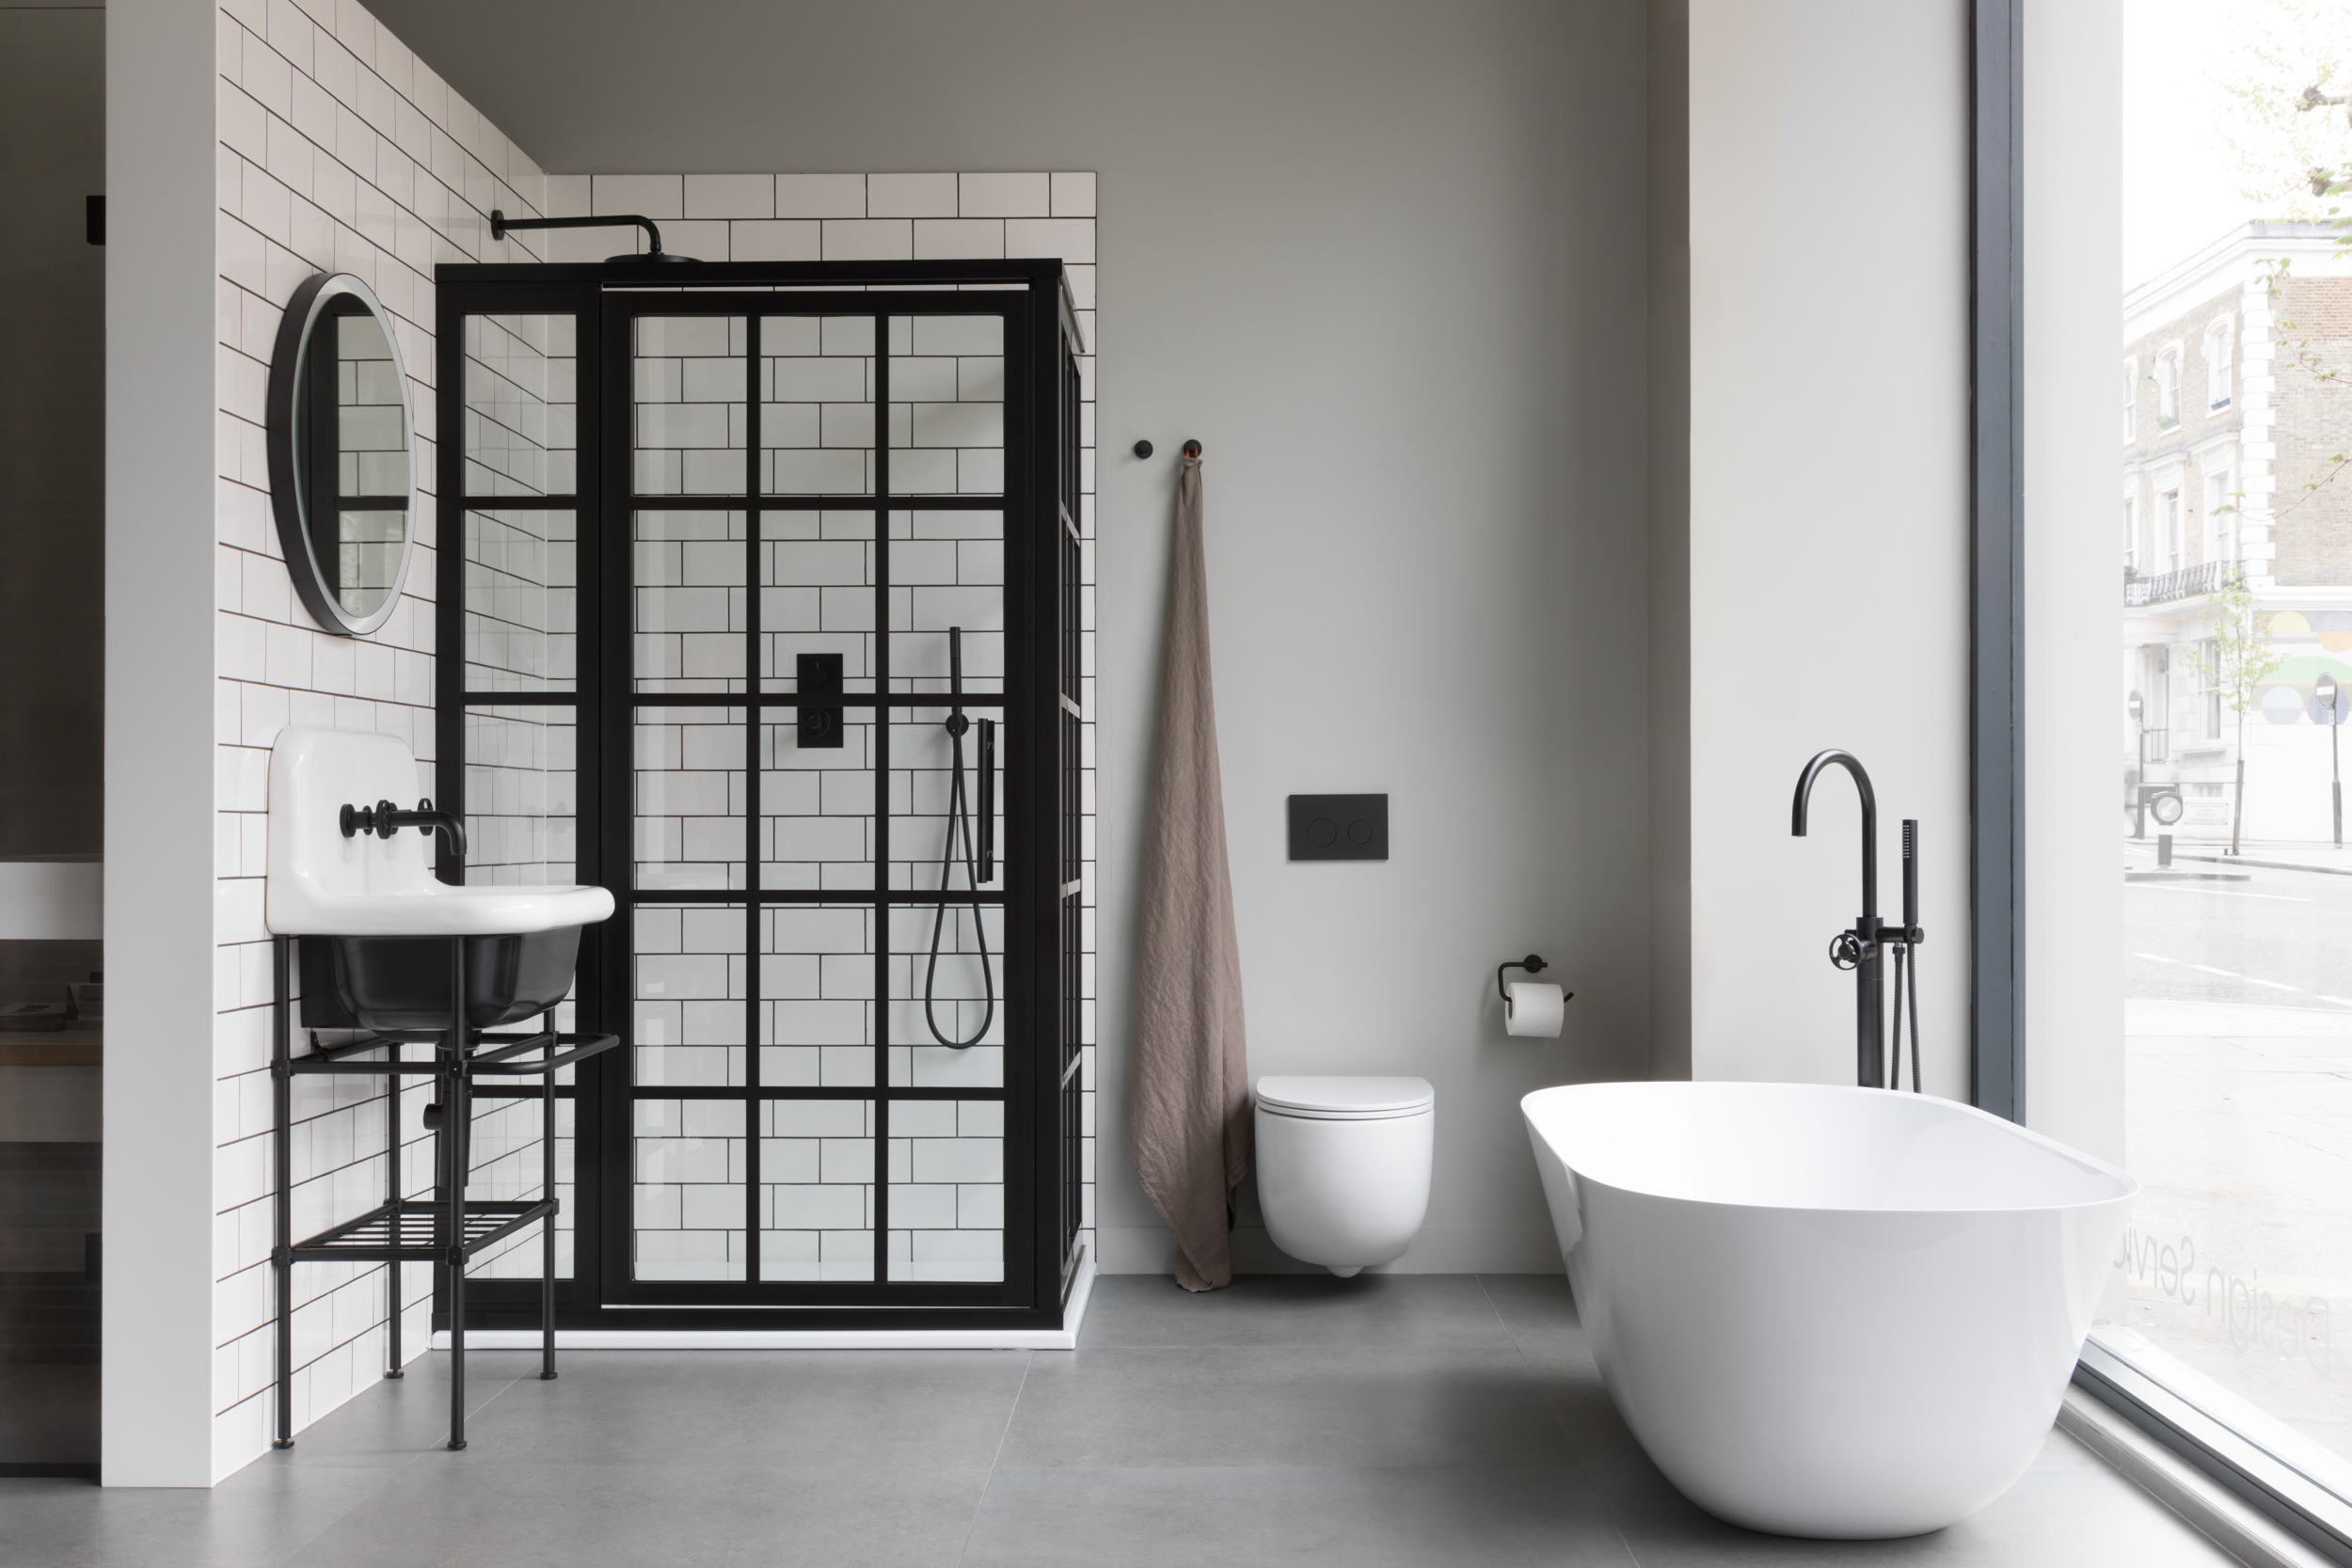 Paul Craig, Interior Photographer, Commercial Photography, London, Bathroom Showroom